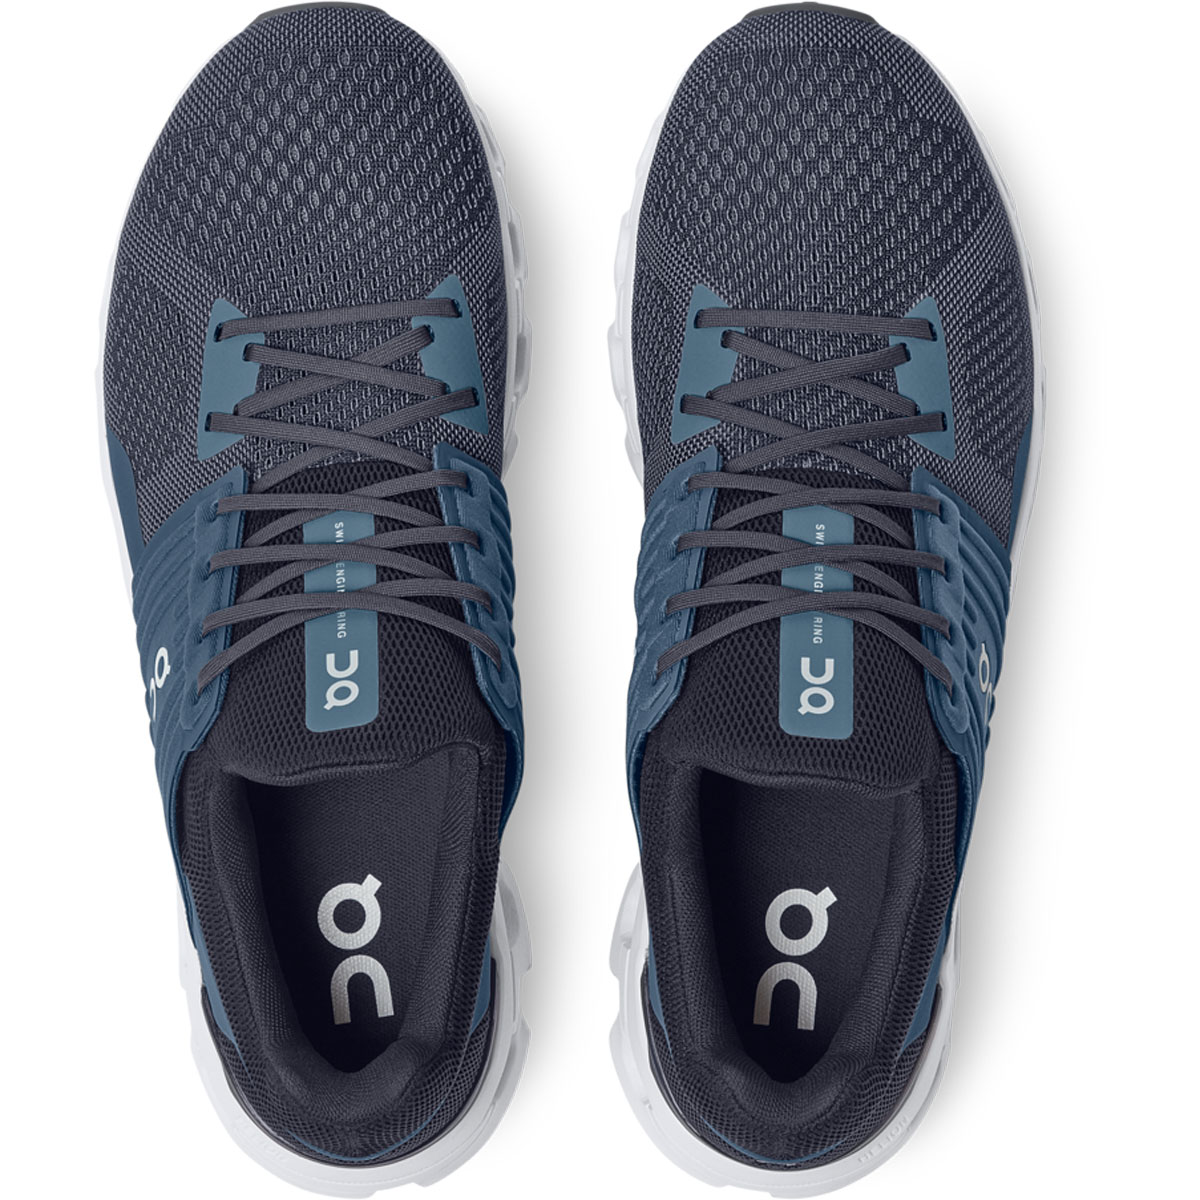 Men's On Cloudswift 2.0 Running Shoe - Color: Denim/Midnight - Size: 7 - Width: Regular, Denim/Midnight, large, image 3